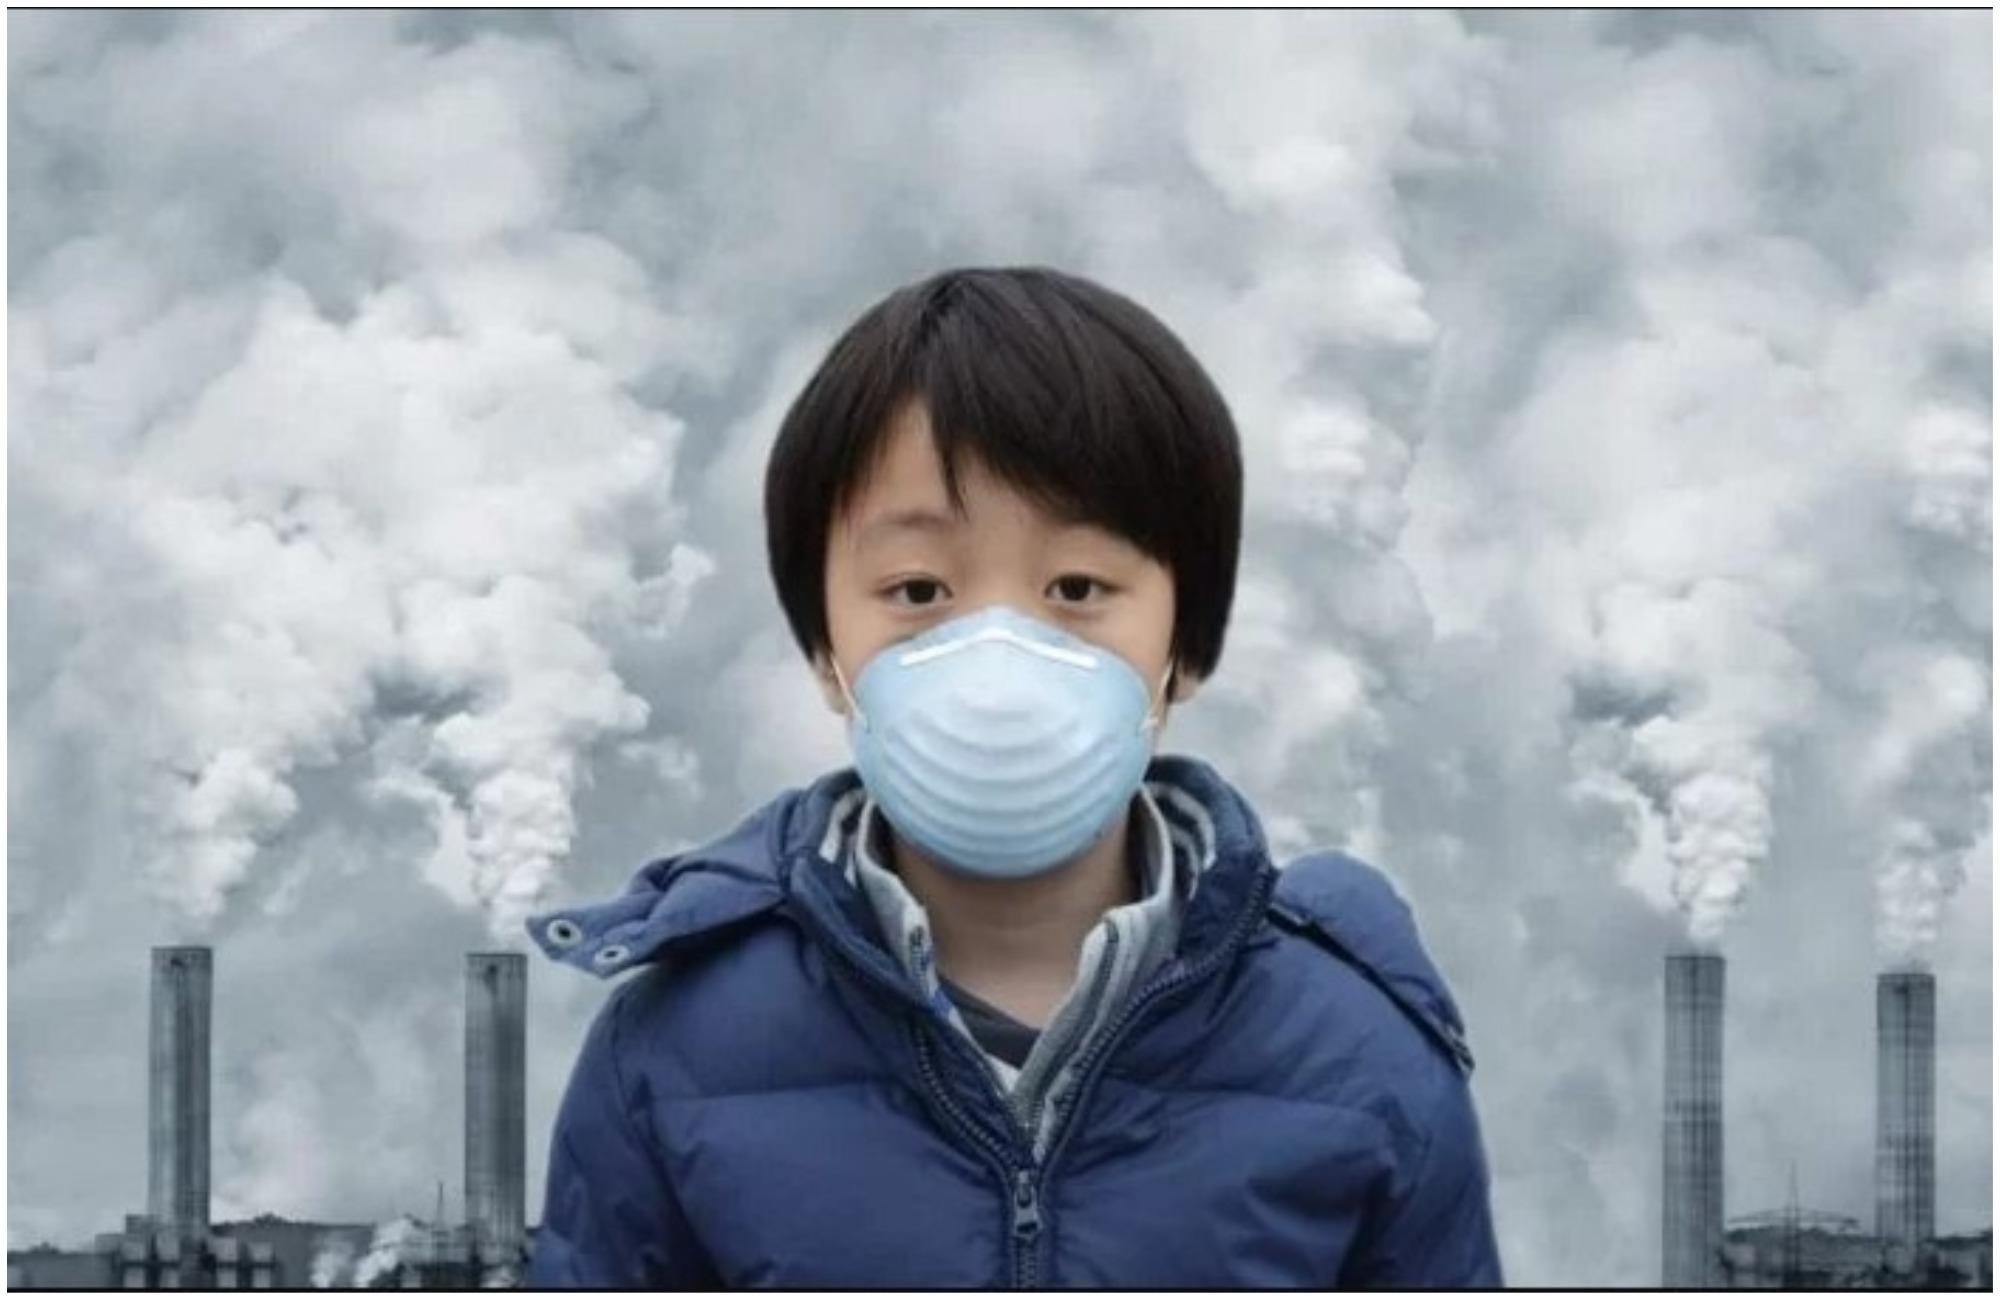 ajri i ndotur te femijet